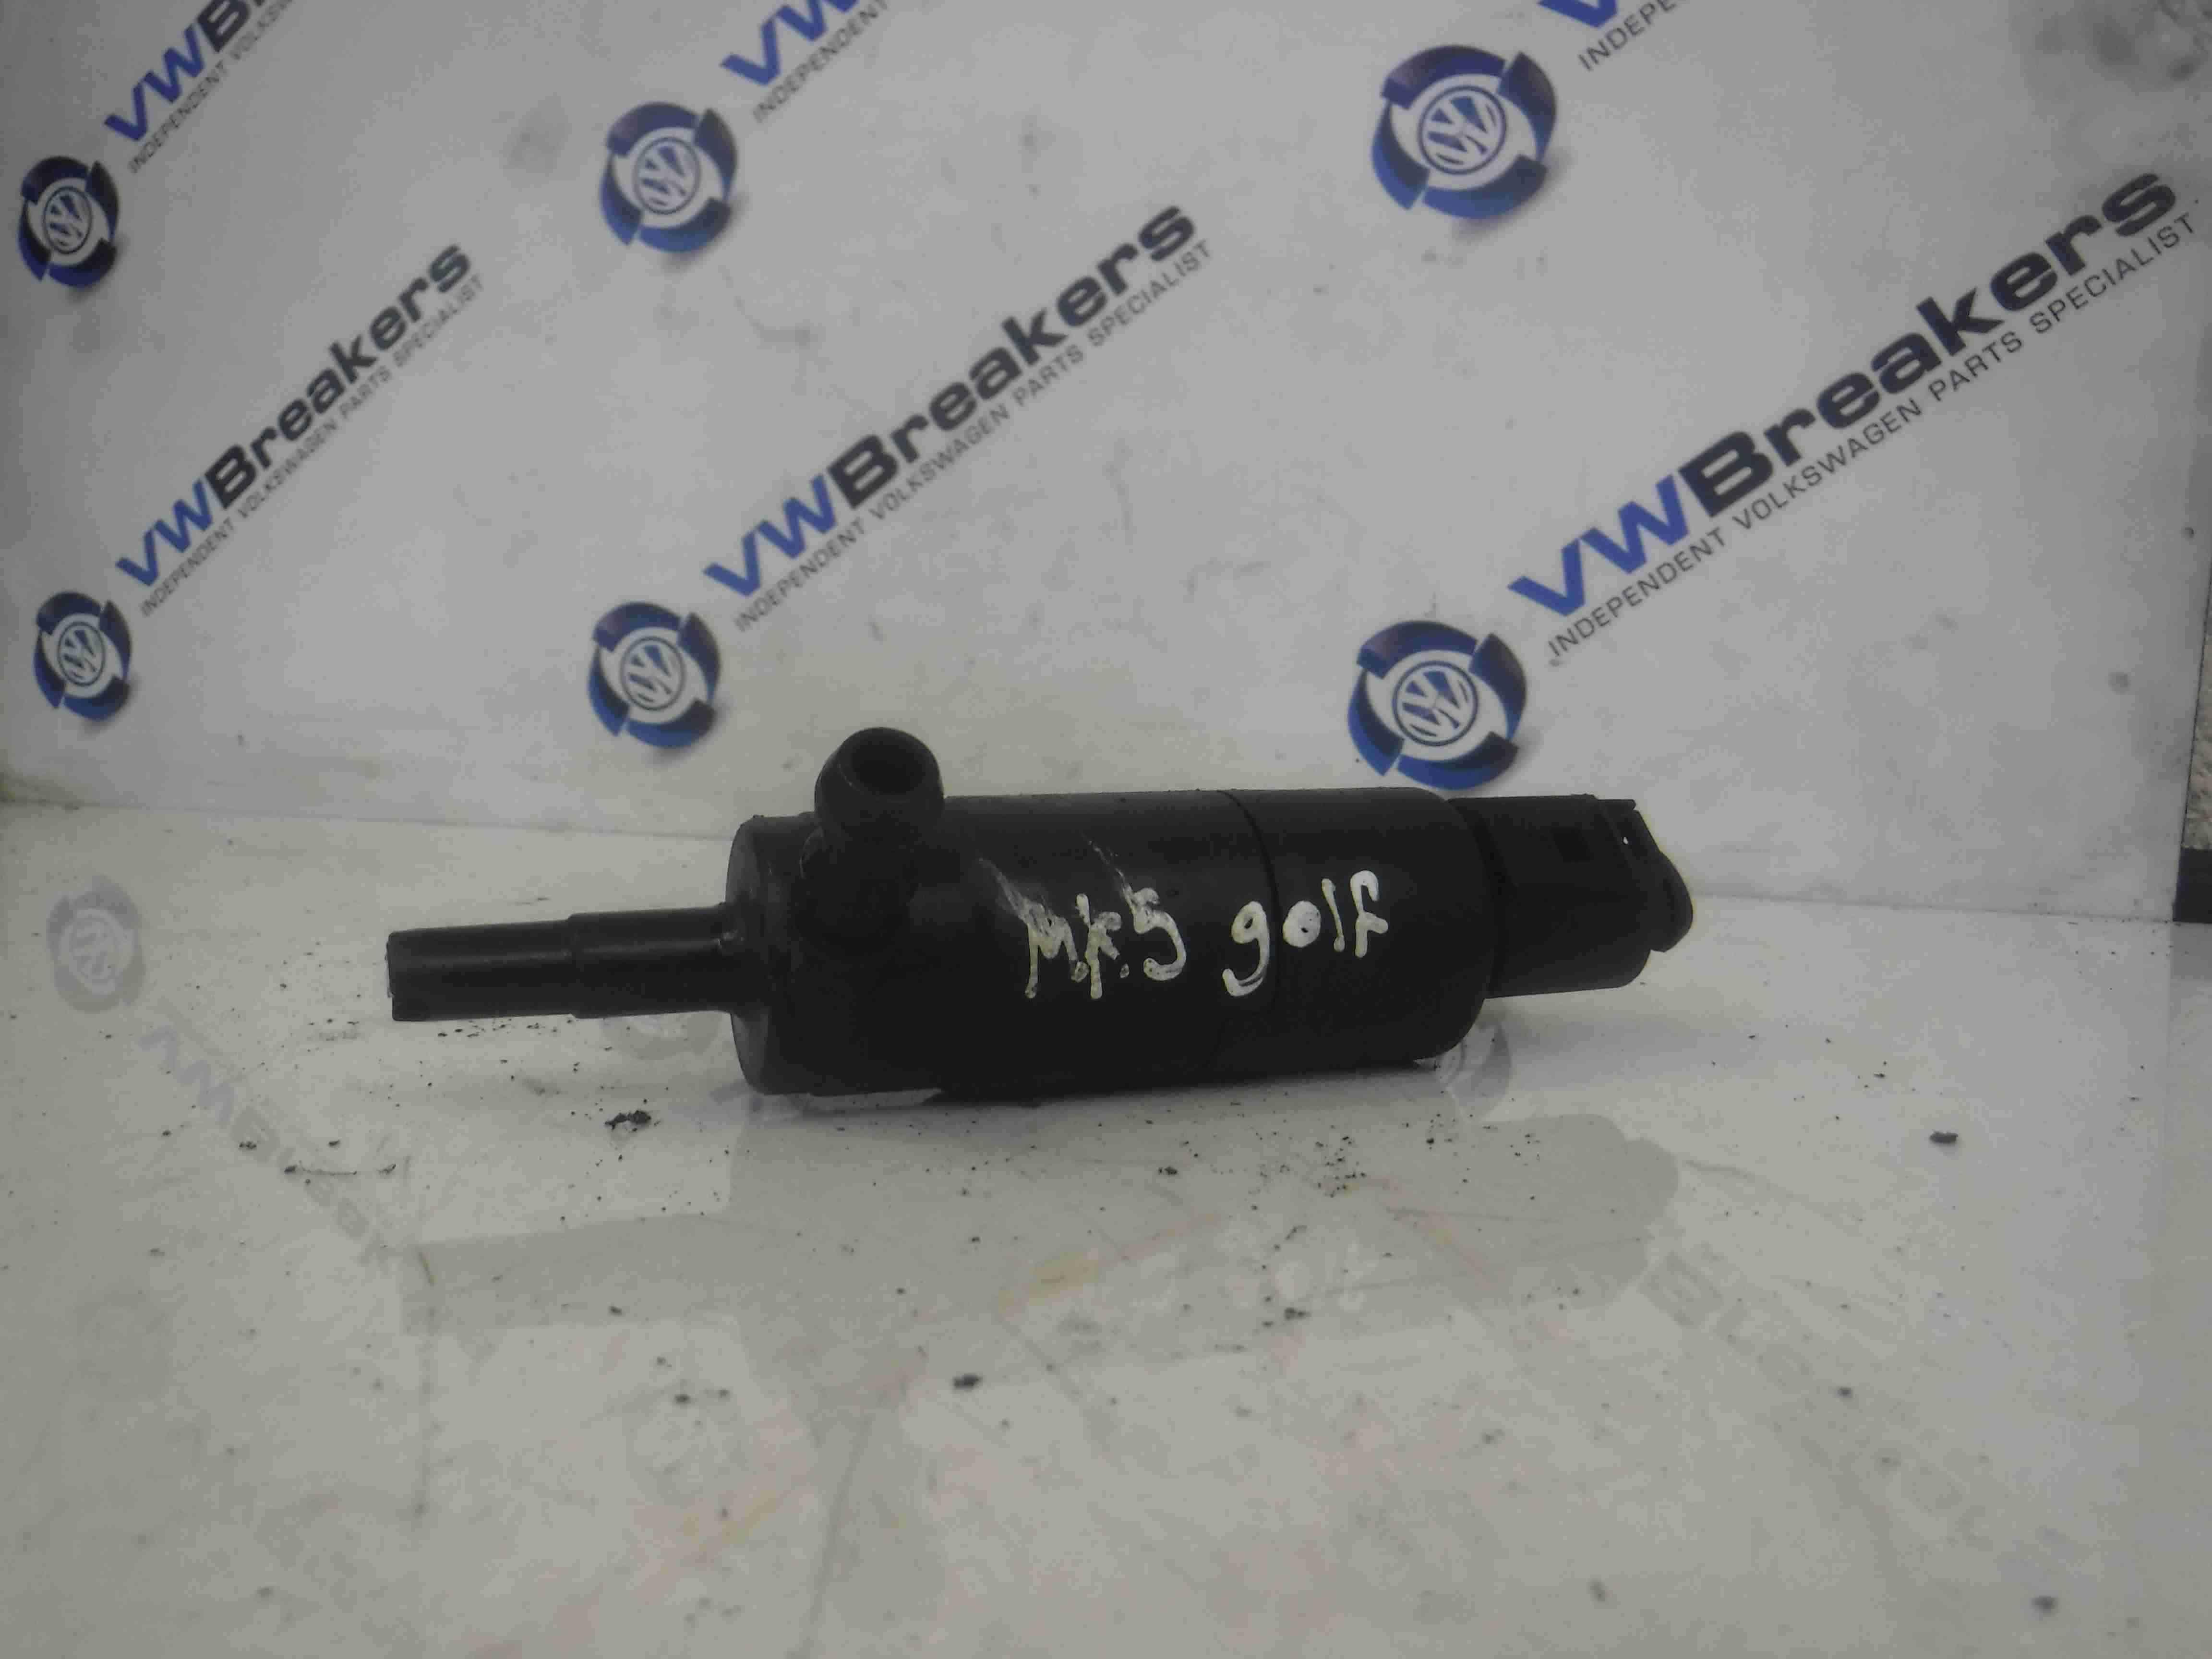 Volkswagen Golf MK5 2003-2009 Headlight Washer Pump Motor 3B7955681